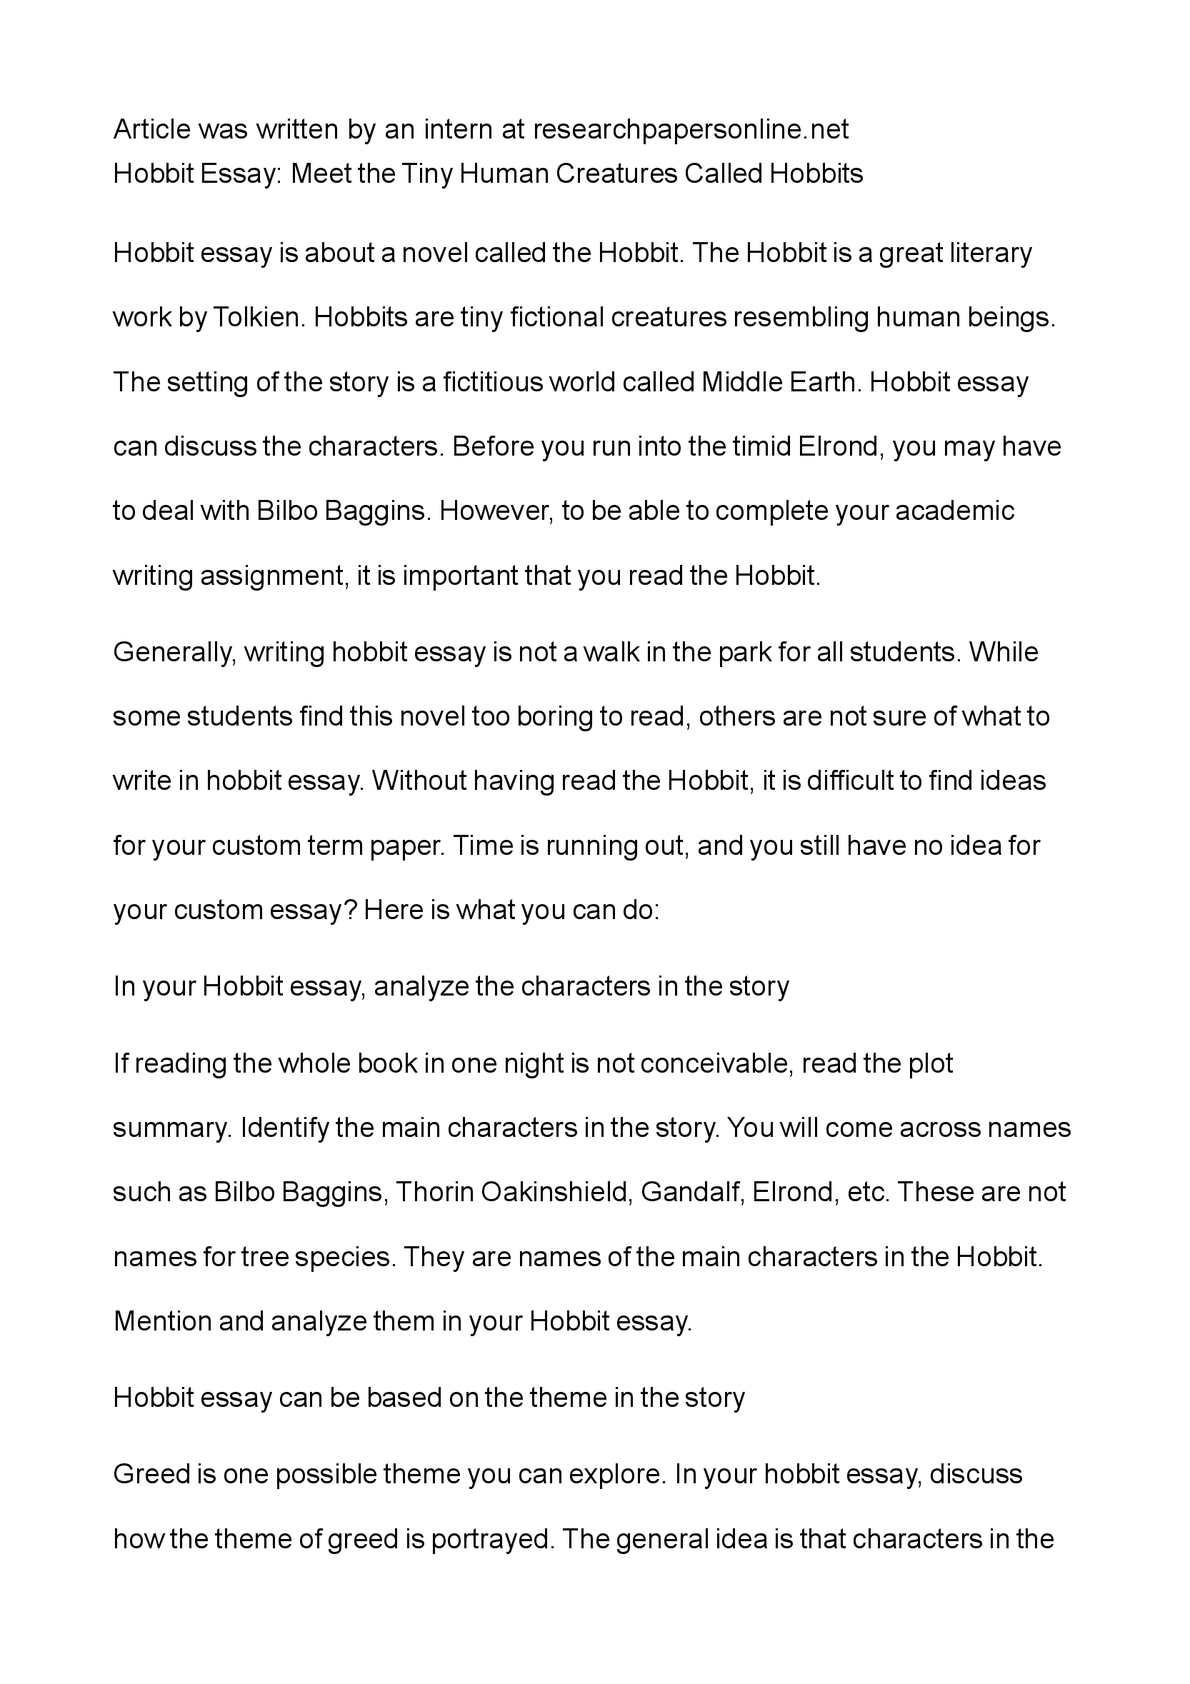 012 Running Essay P1 Frightening In Hindi Race Outline Full